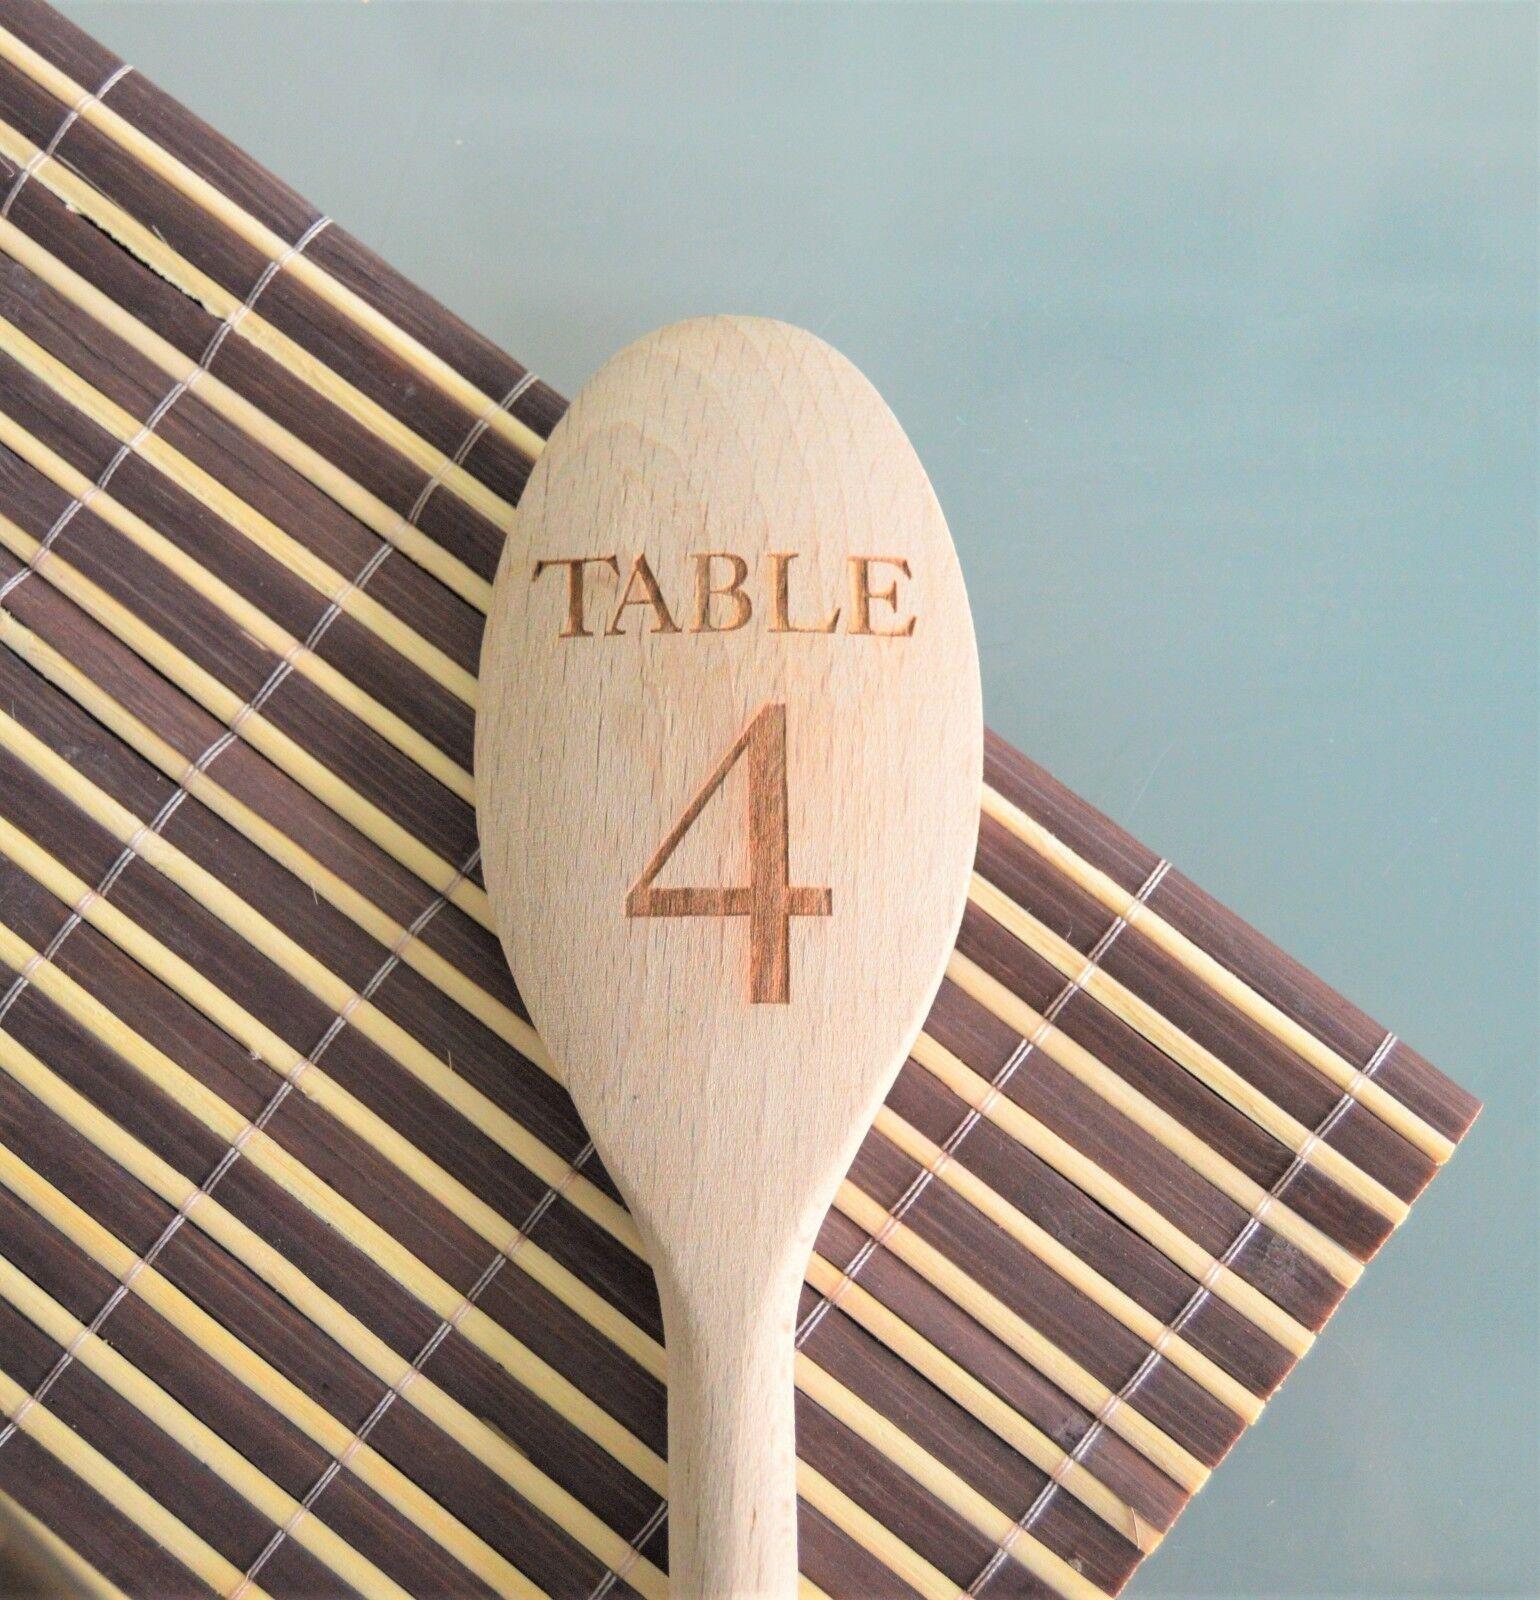 Engraved Wooden Spoon - Table Number Design for Weddings, Restaurants, Hotels